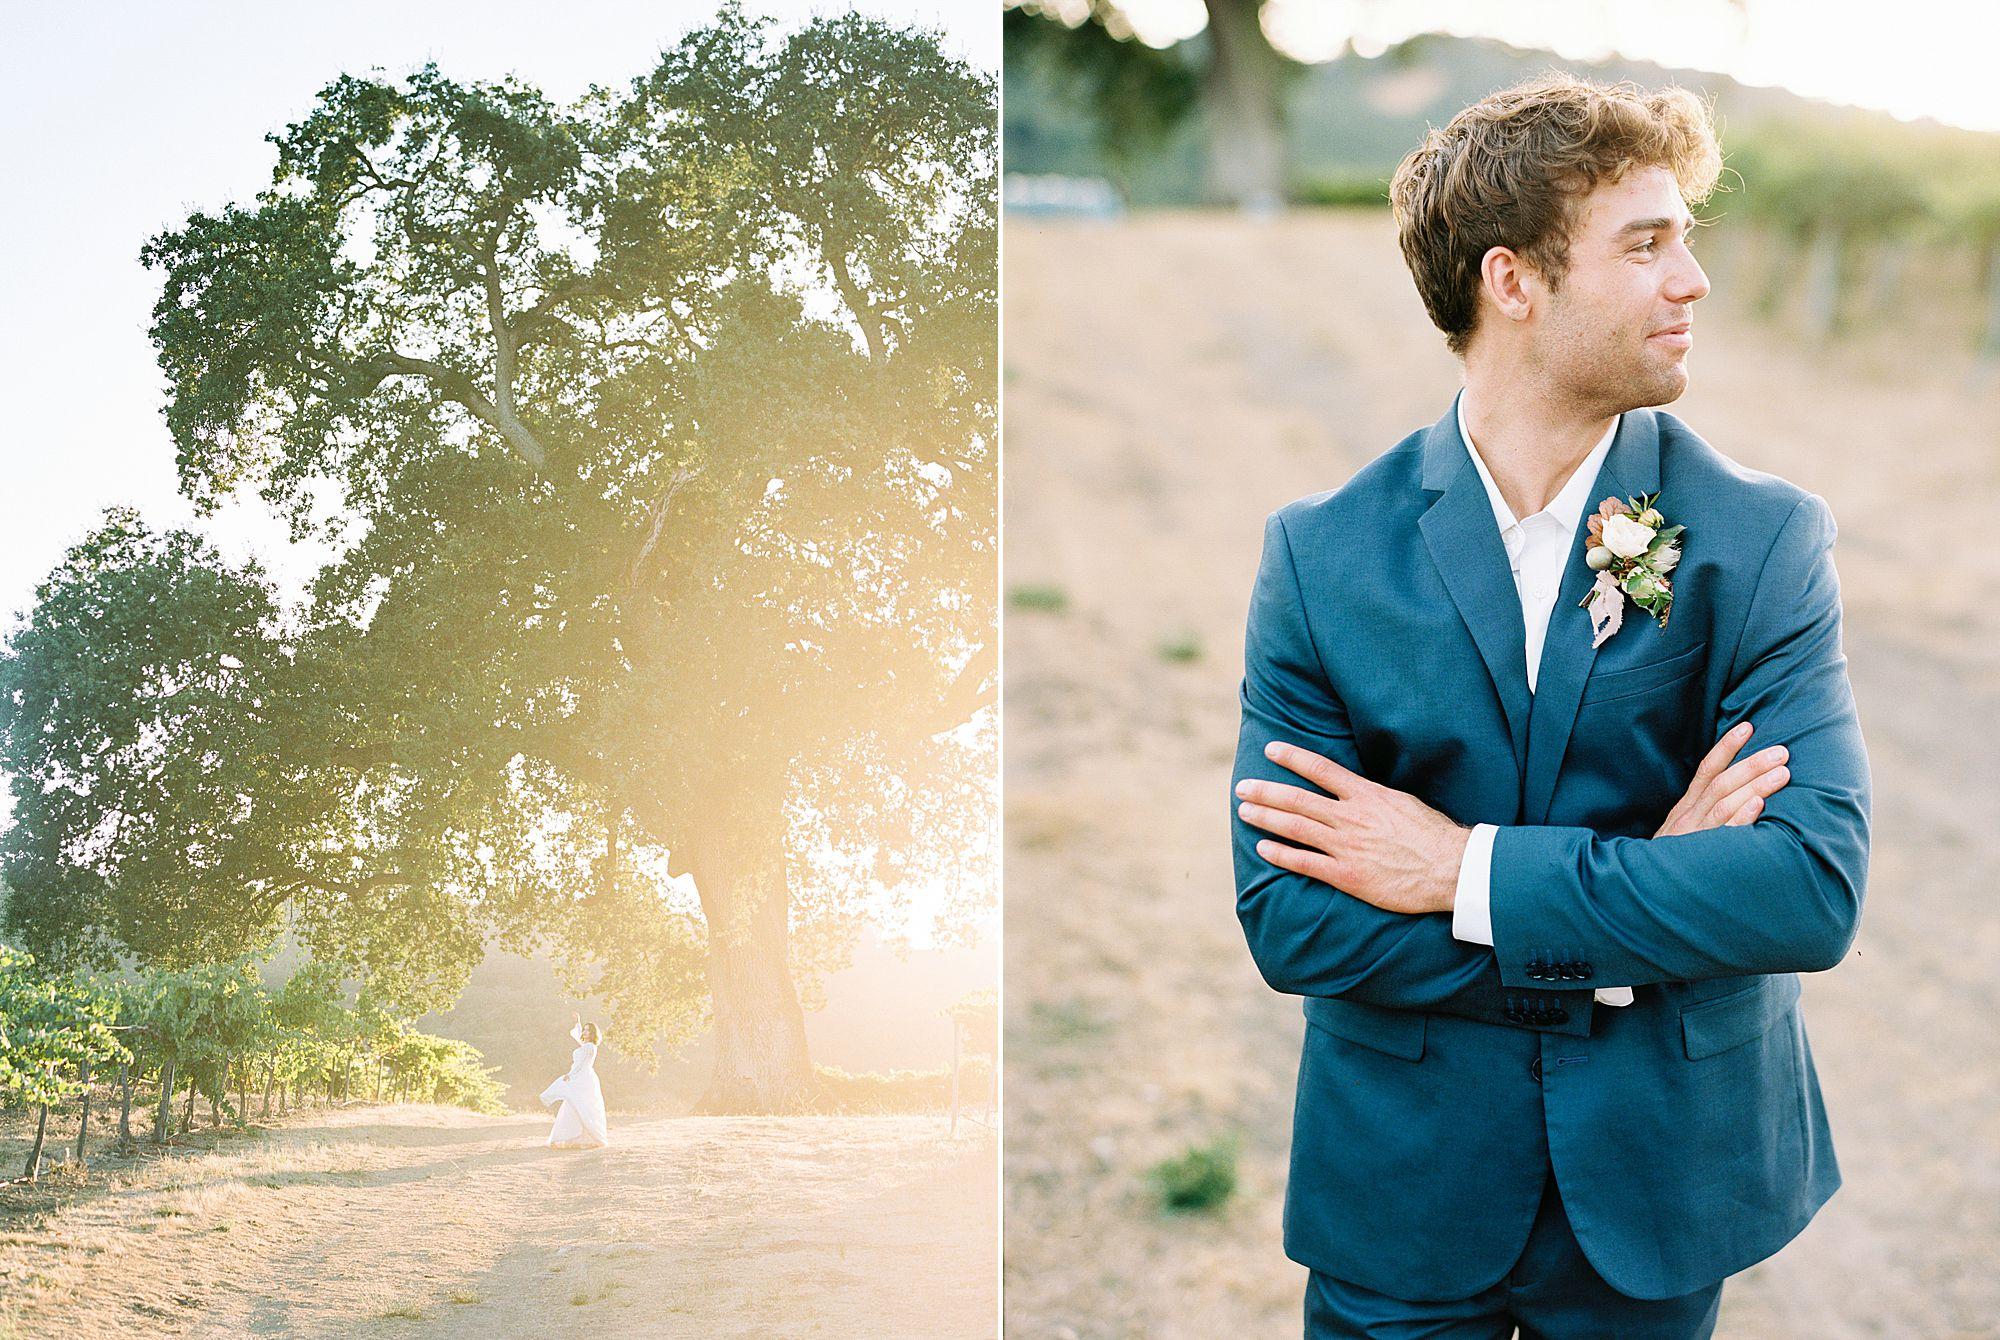 HammerSky Wedding Inspiration Featured on Hey Wedding Lady with Vanessa Noel Events - Ashley Baumgartner - SLO Wedding Photographer_0039.jpg